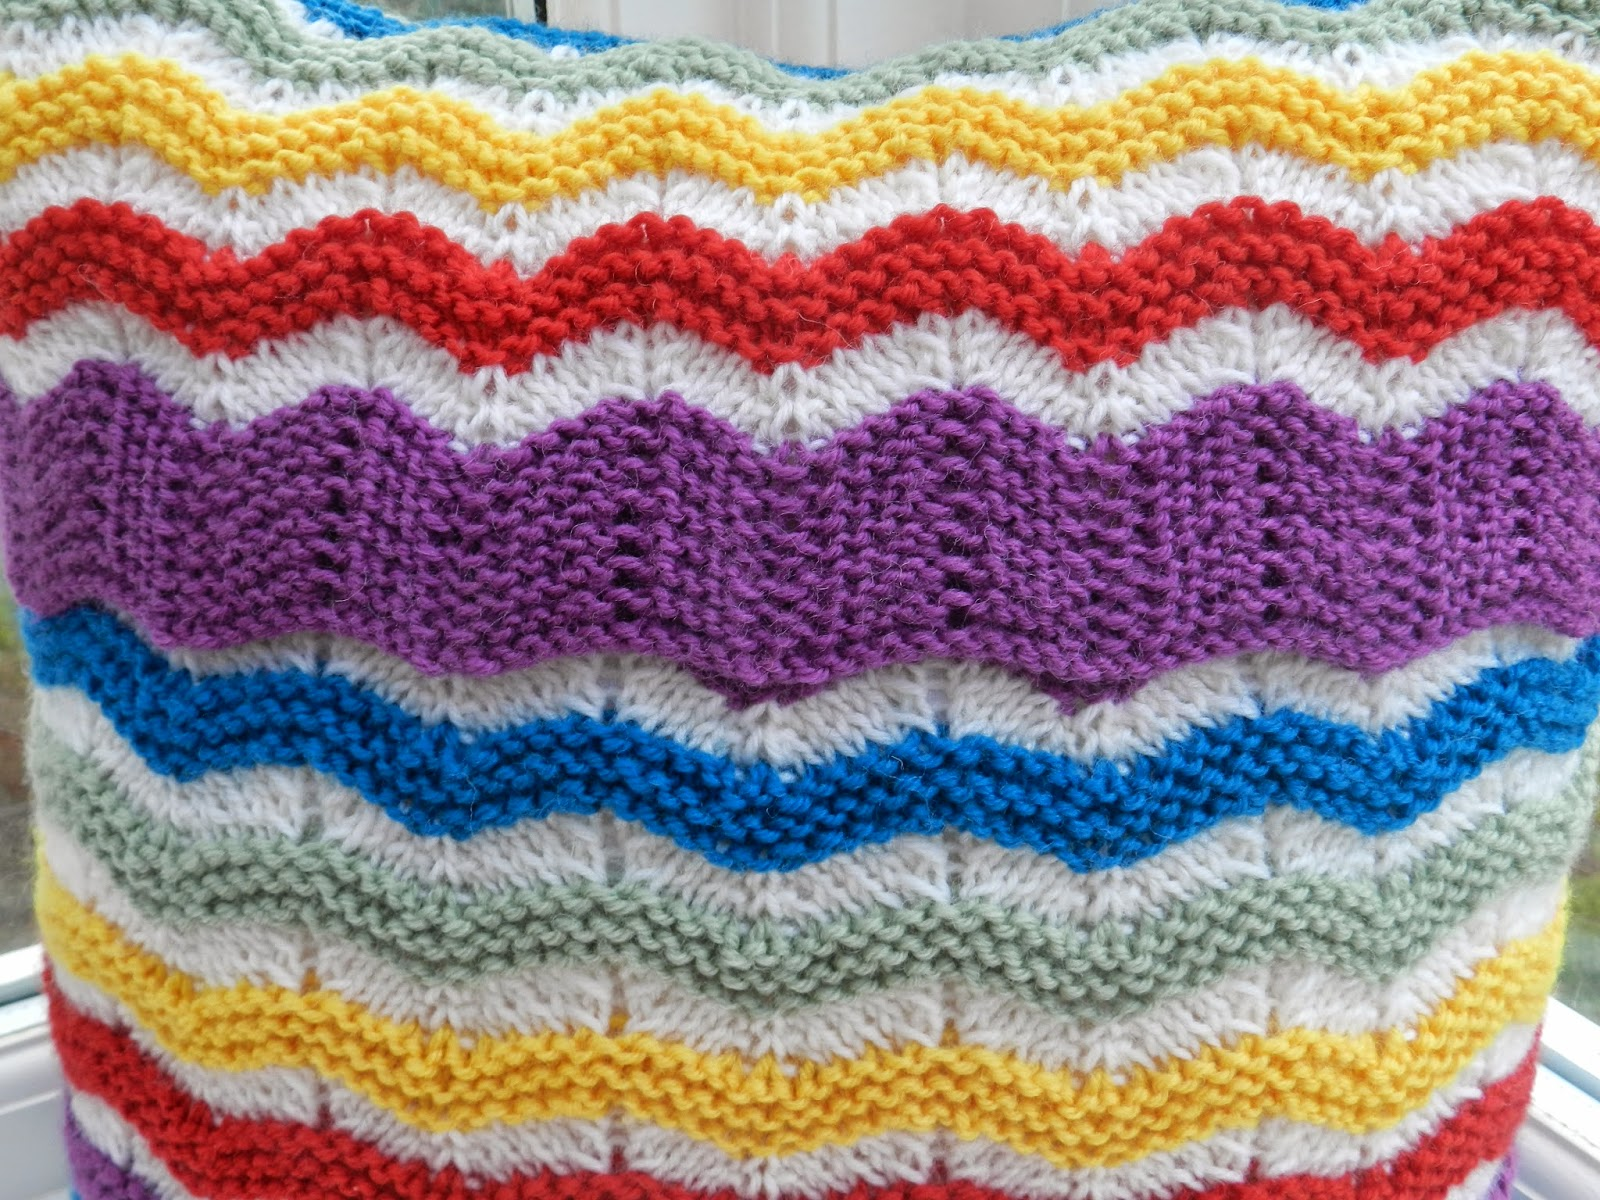 Rainbow Cushion Knitting Pattern : Emma Vining Hand Knitting: Knit Today Magazine, Issue 100